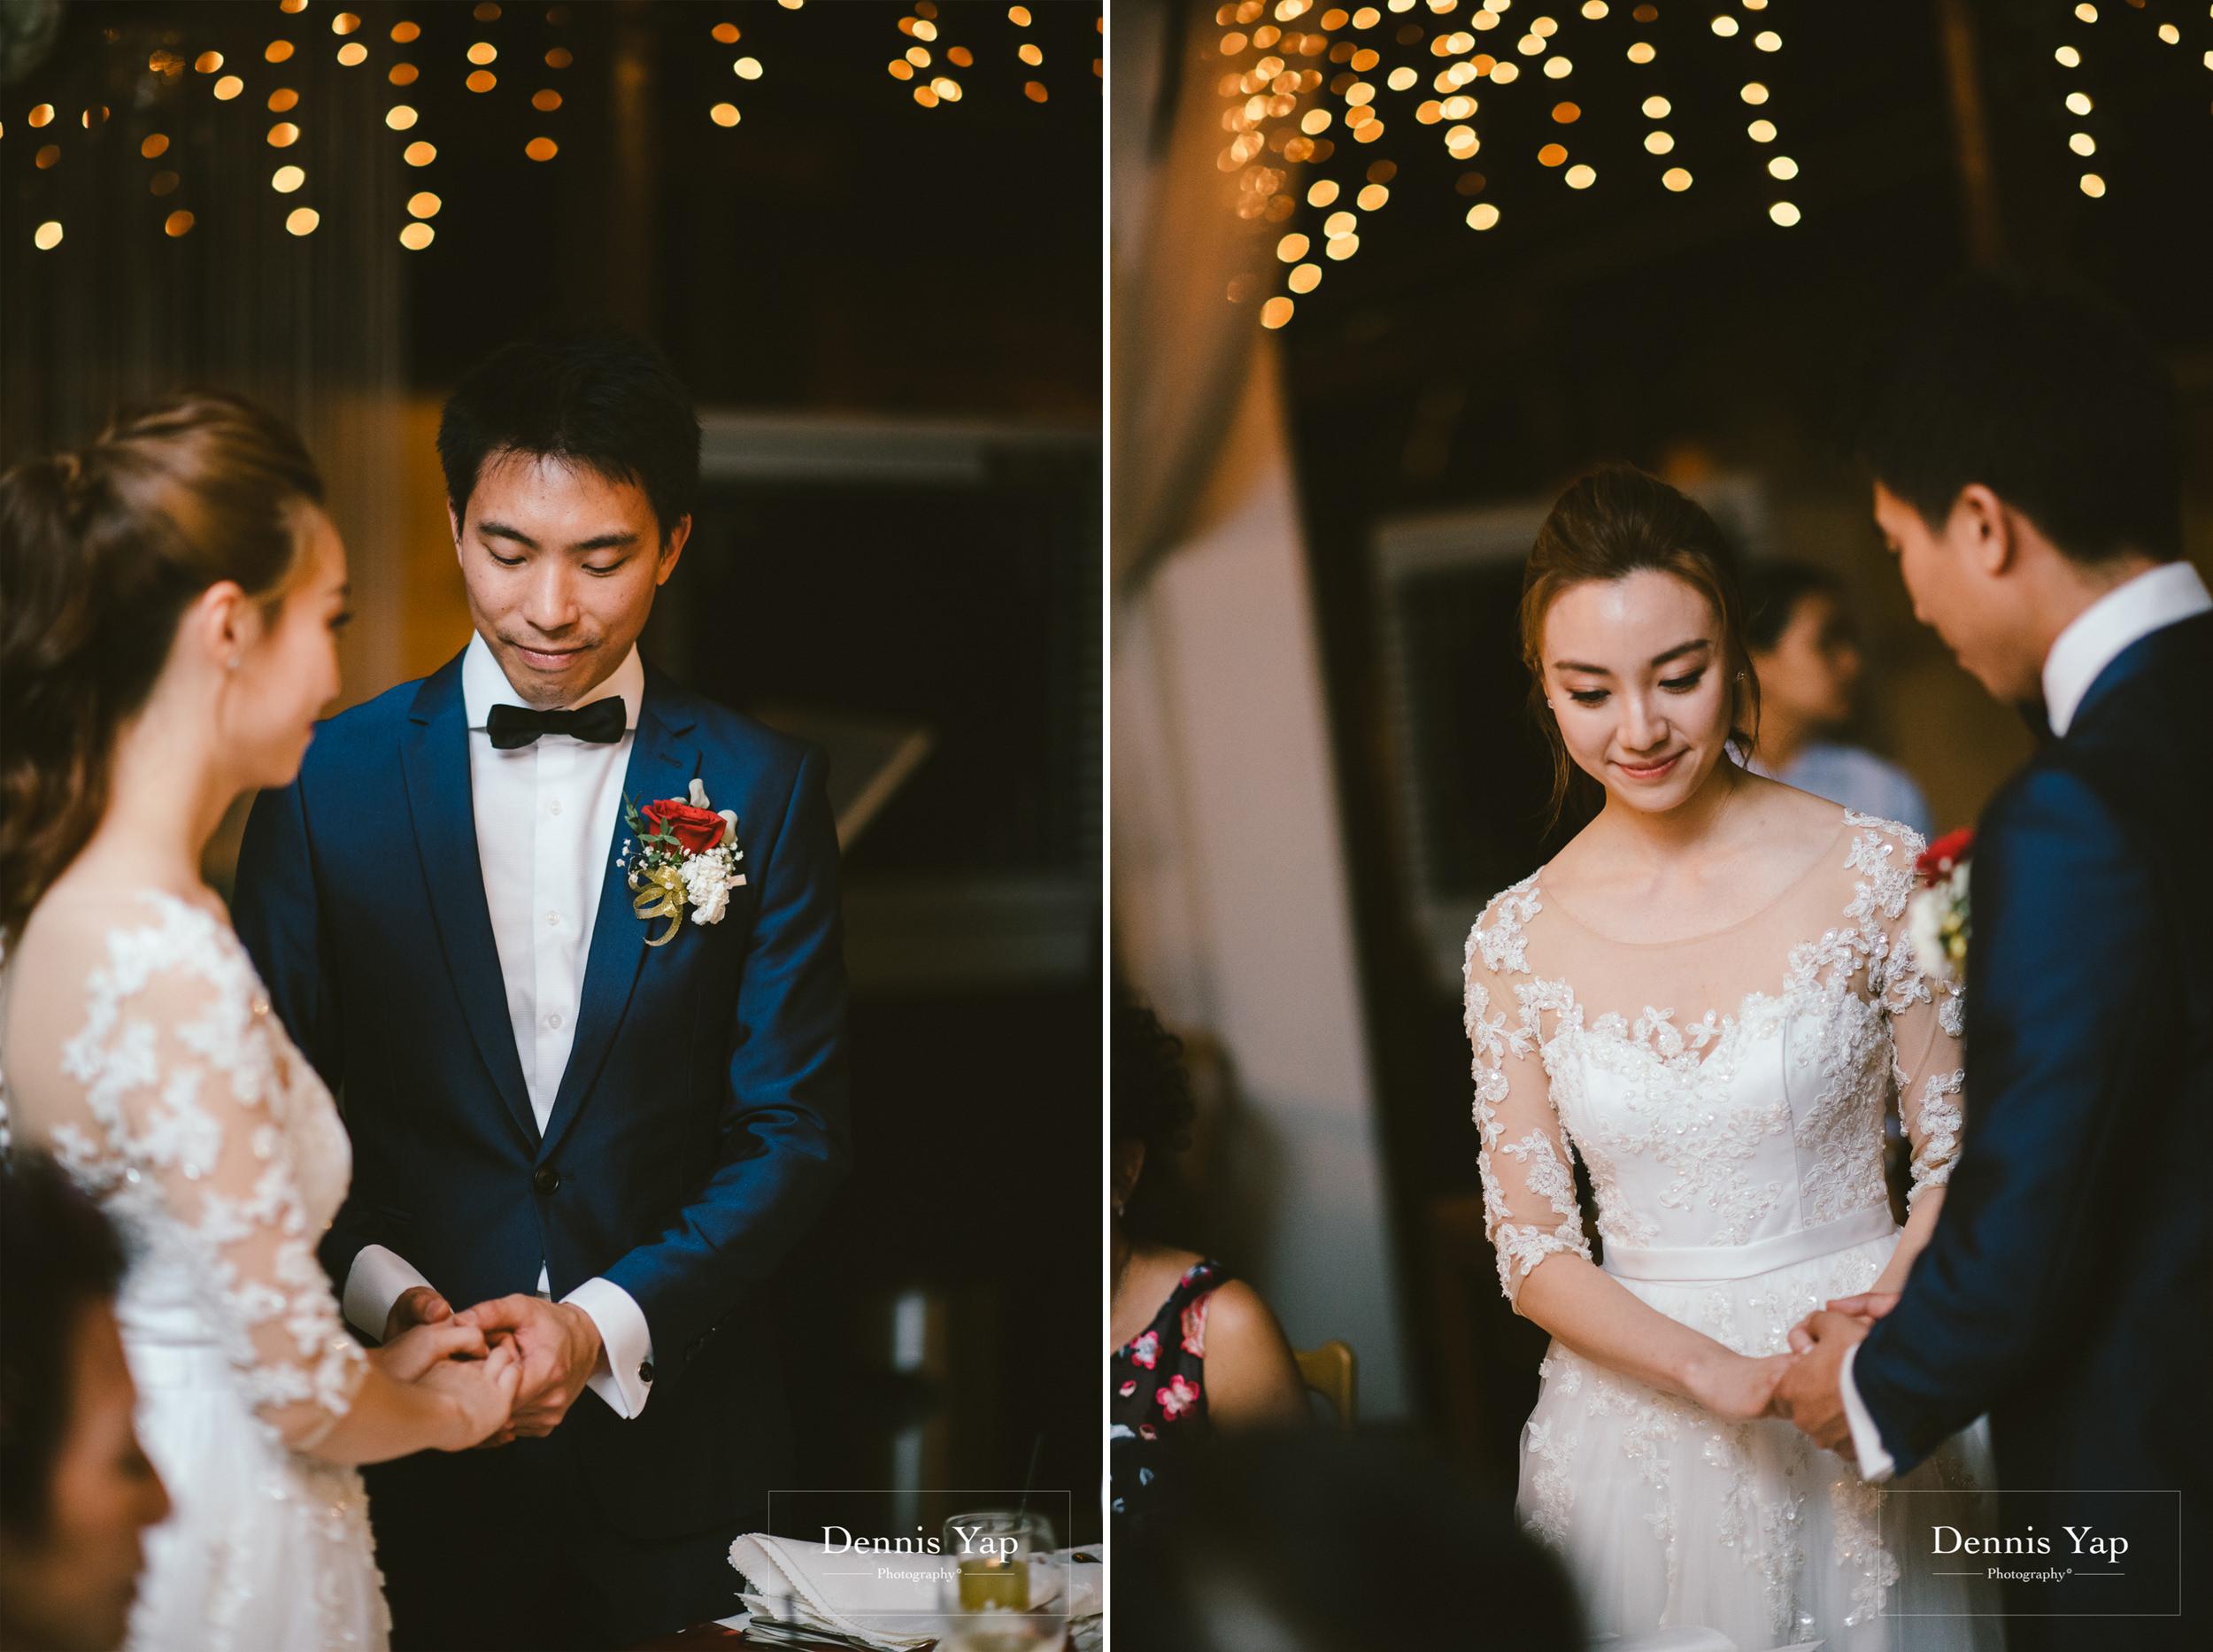 justin hsin wedding day ciao ristorante kuala lumpur dennis yap photography-36.jpg